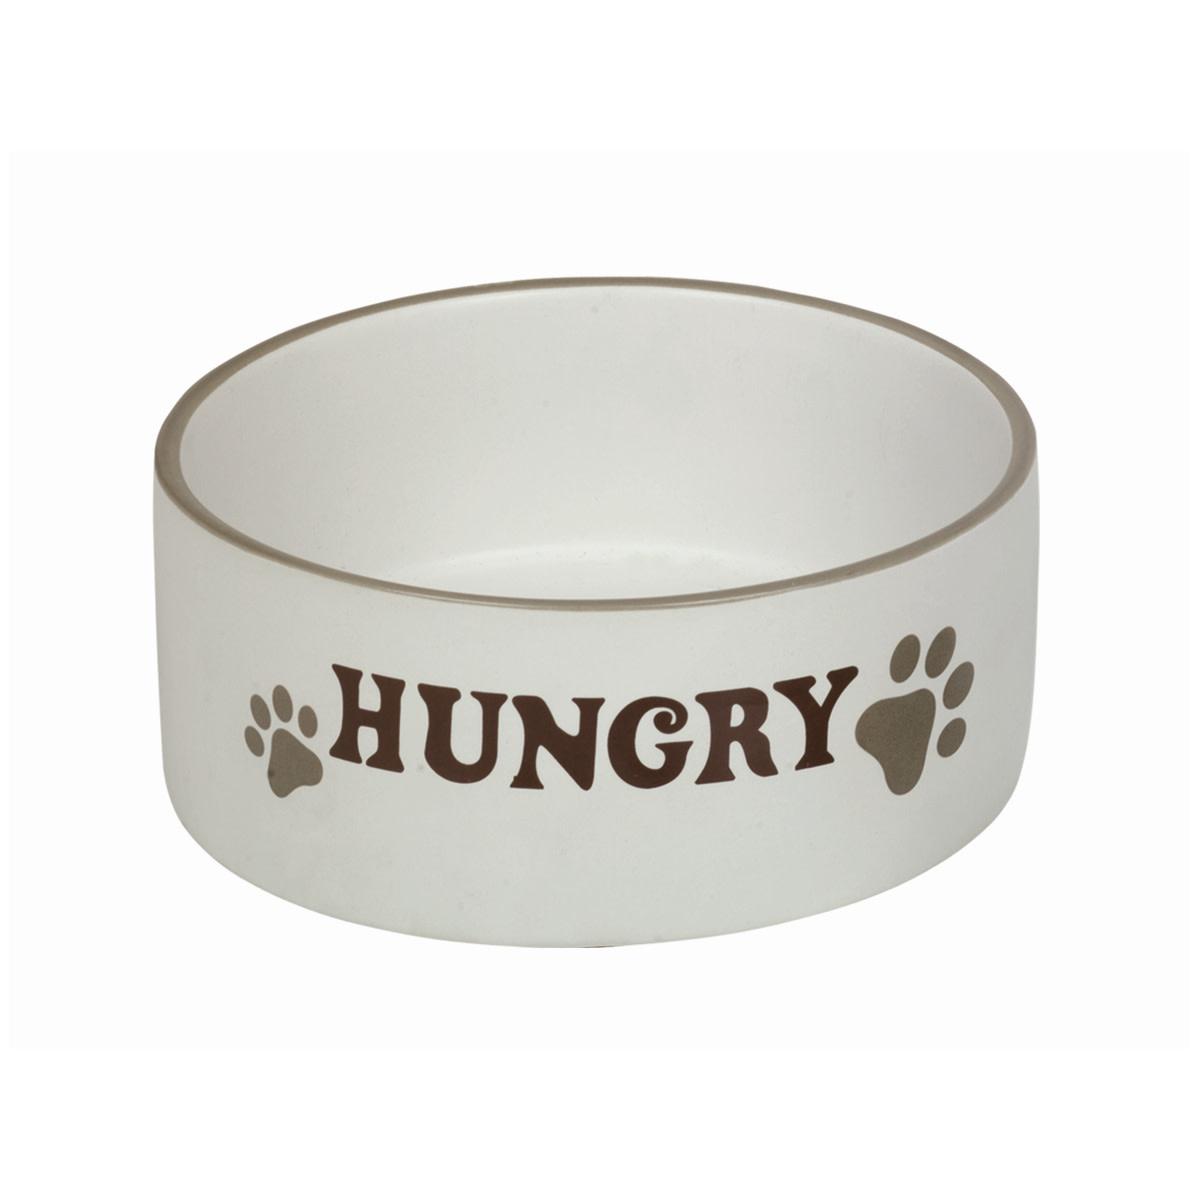 Eetbak Hungry creme 15 cm